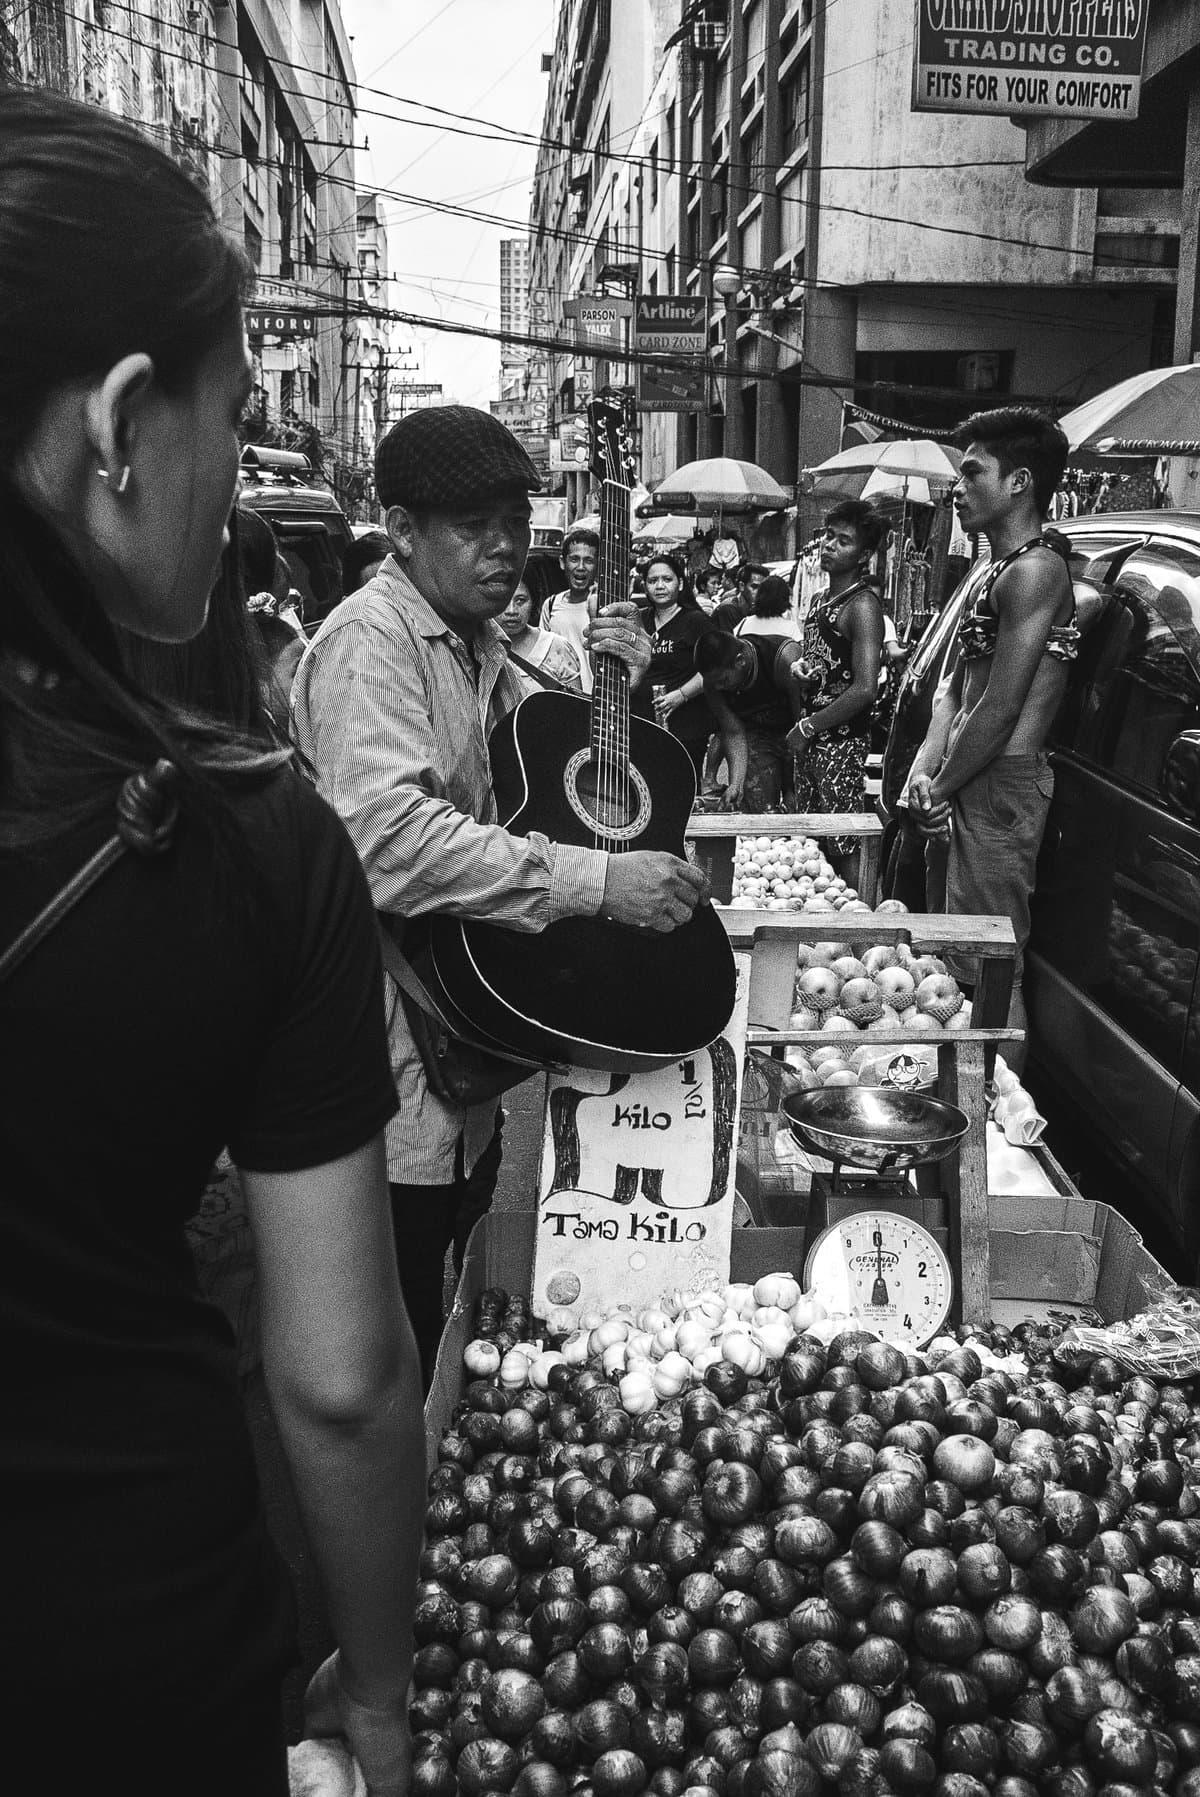 Juan Luna St., Binondo, Manila